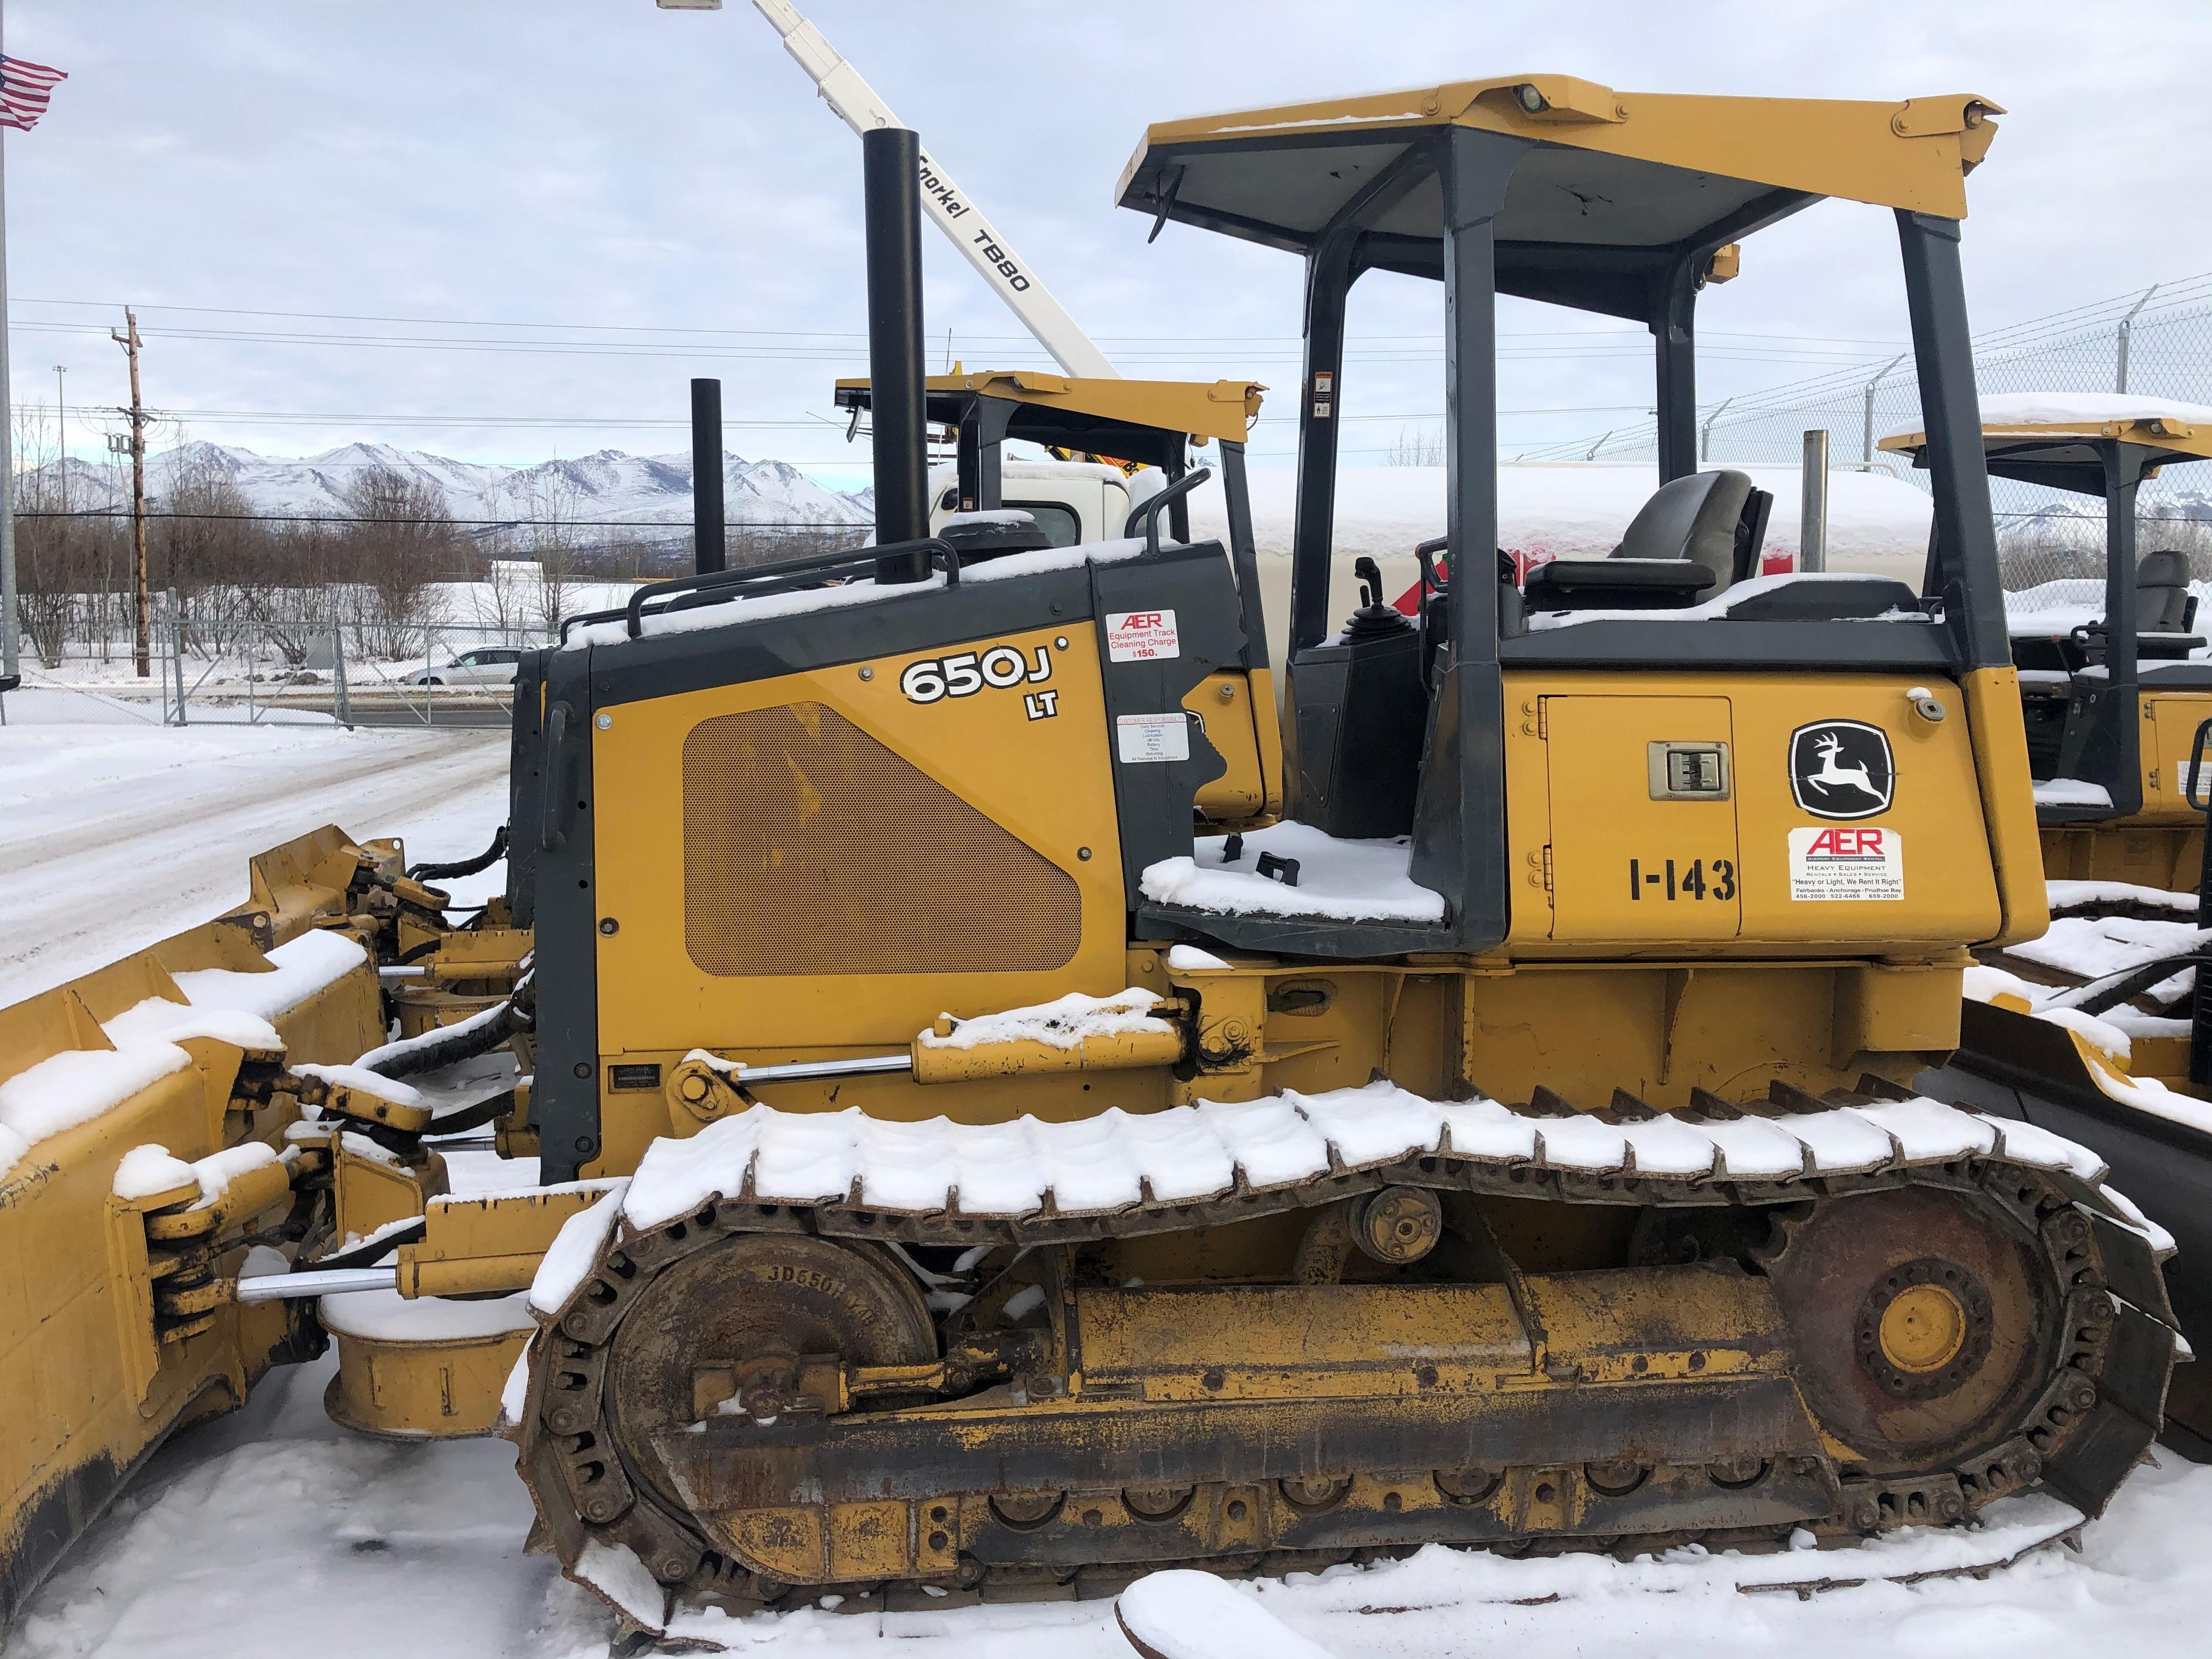 Used, 2005, John Deere Construction, 650J LT, Bulldozers